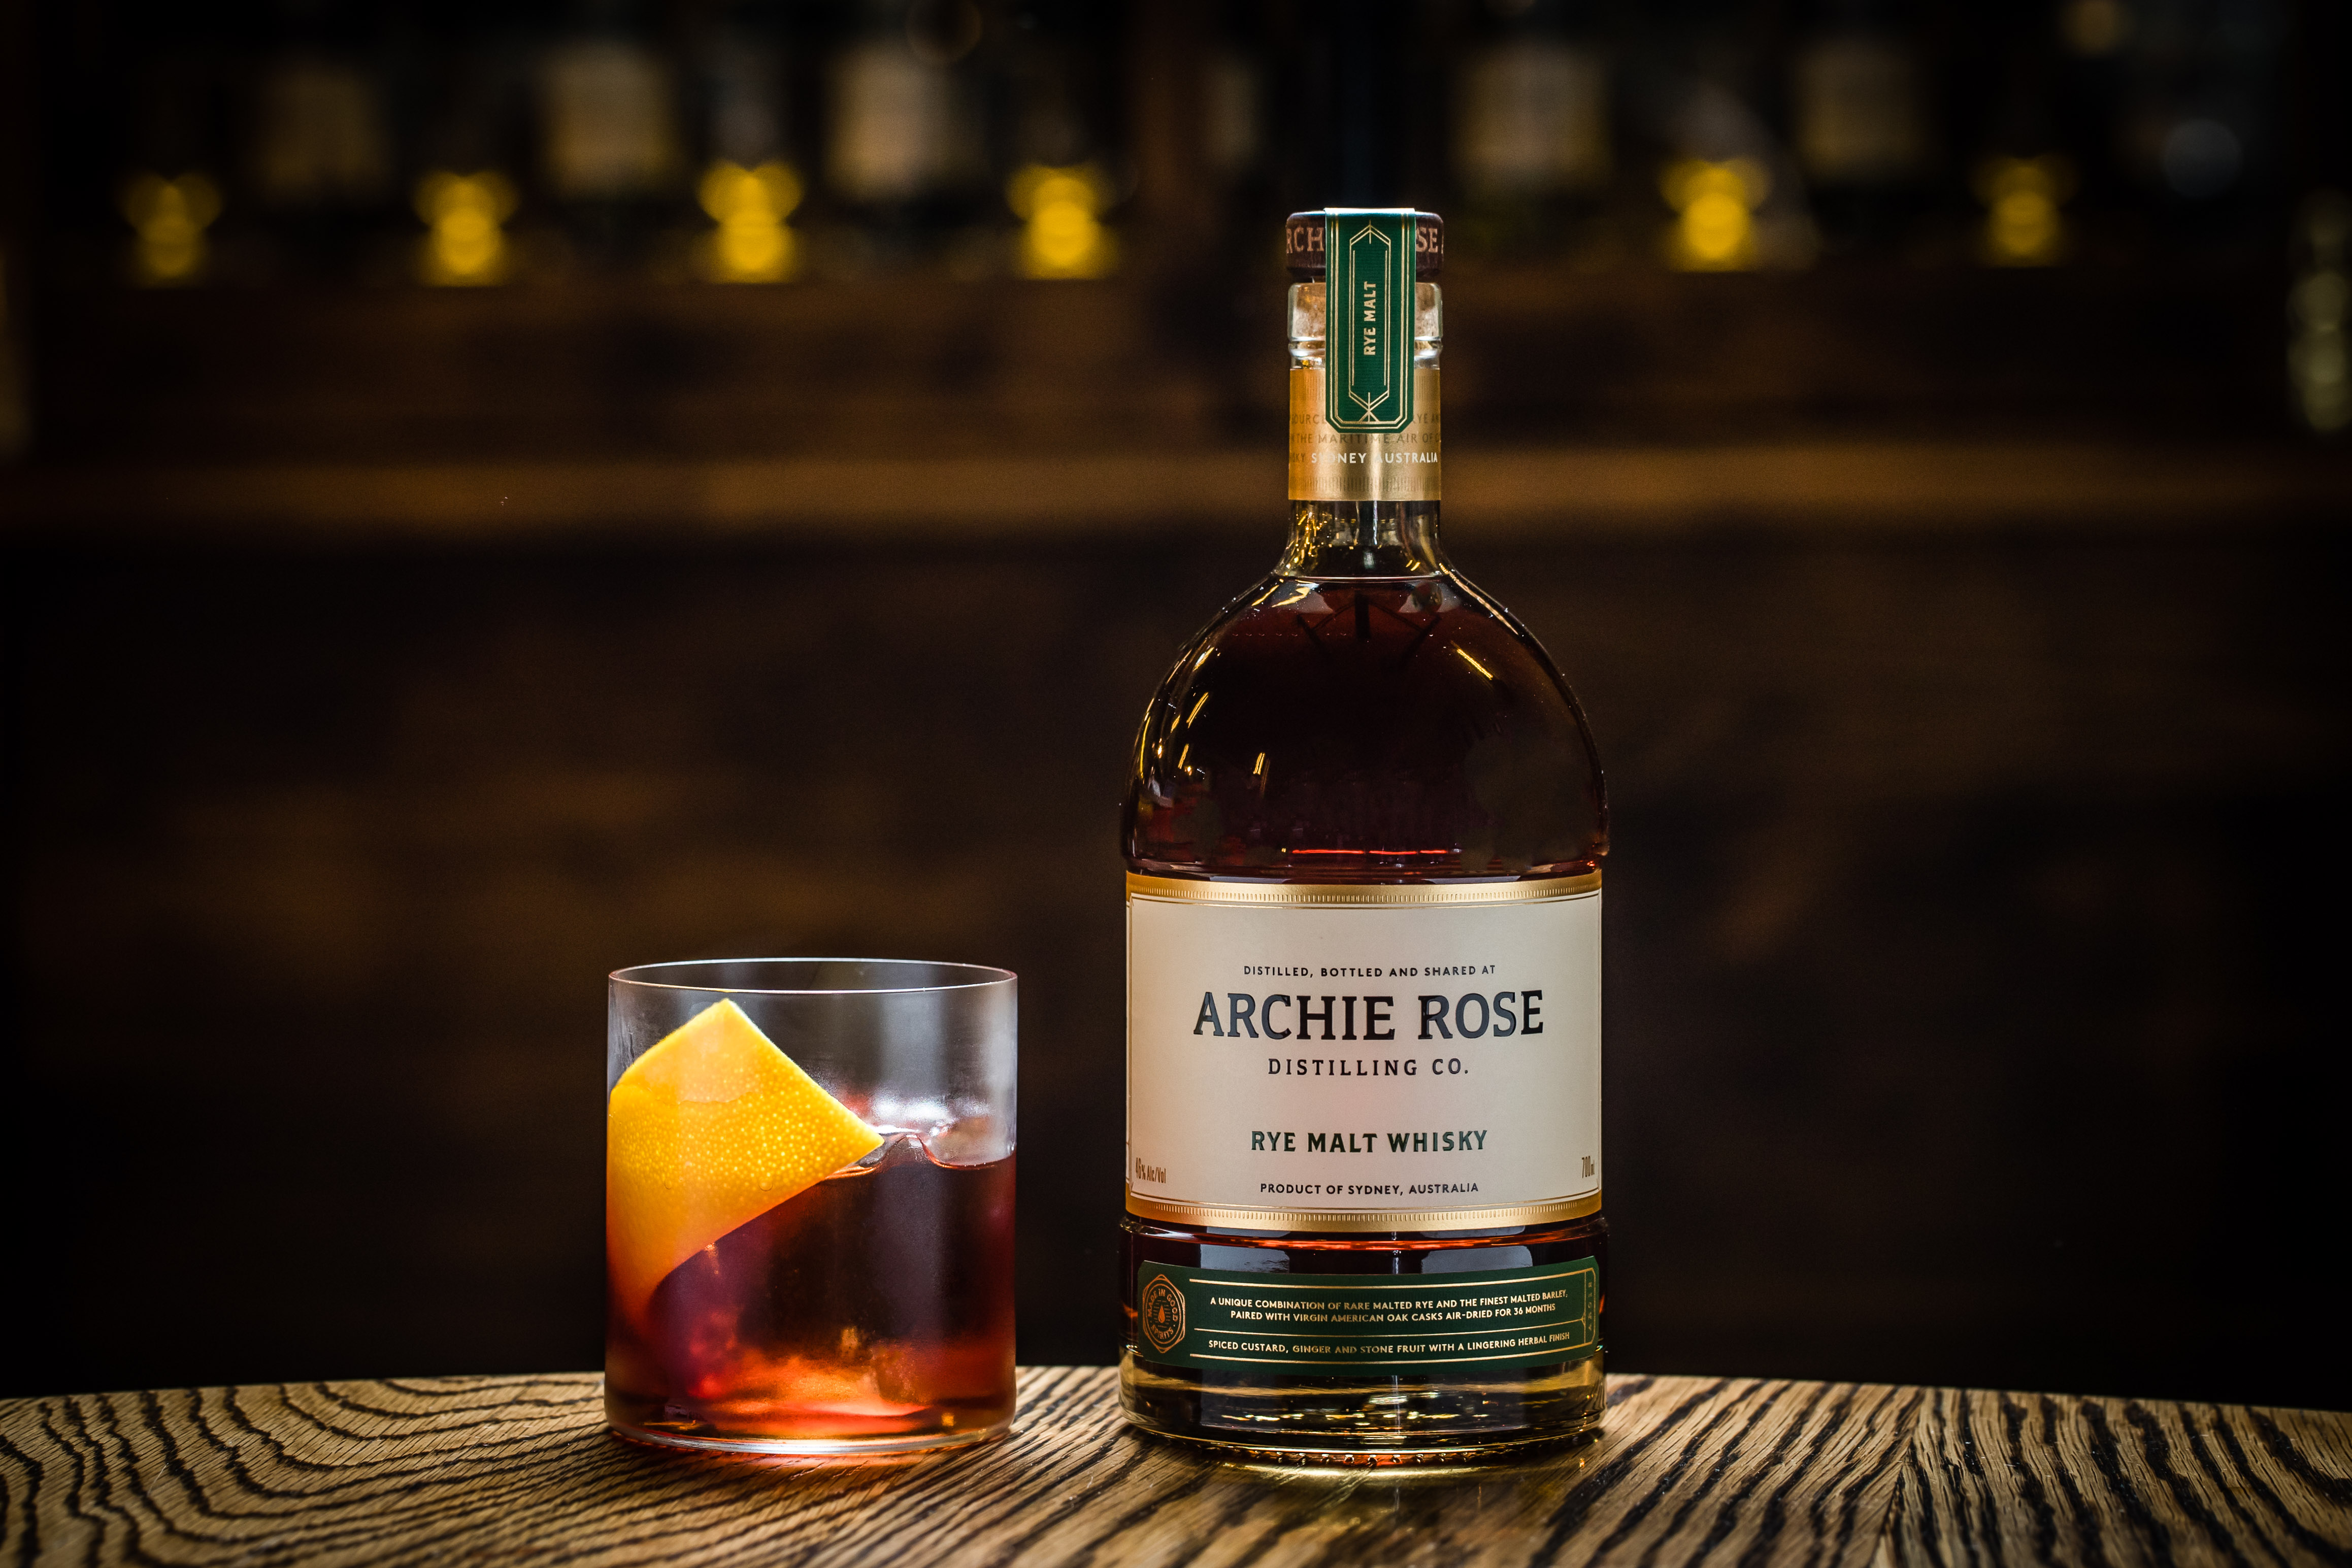 Archie Rose Rye Malt Whisky Boulevardier